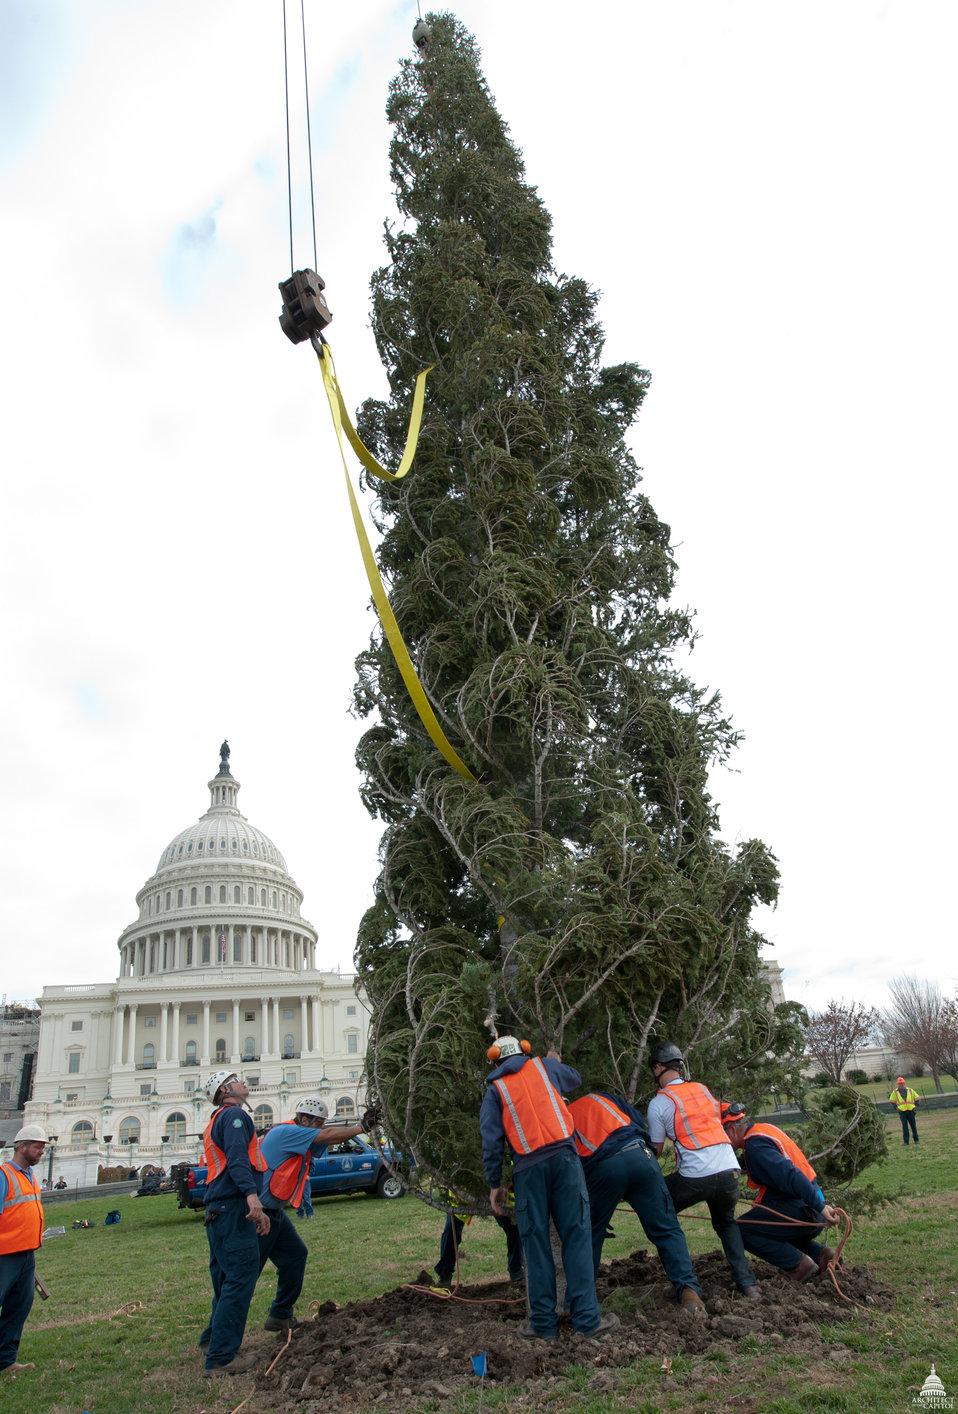 Christmas Tree Arrives as the U.S. Capitol